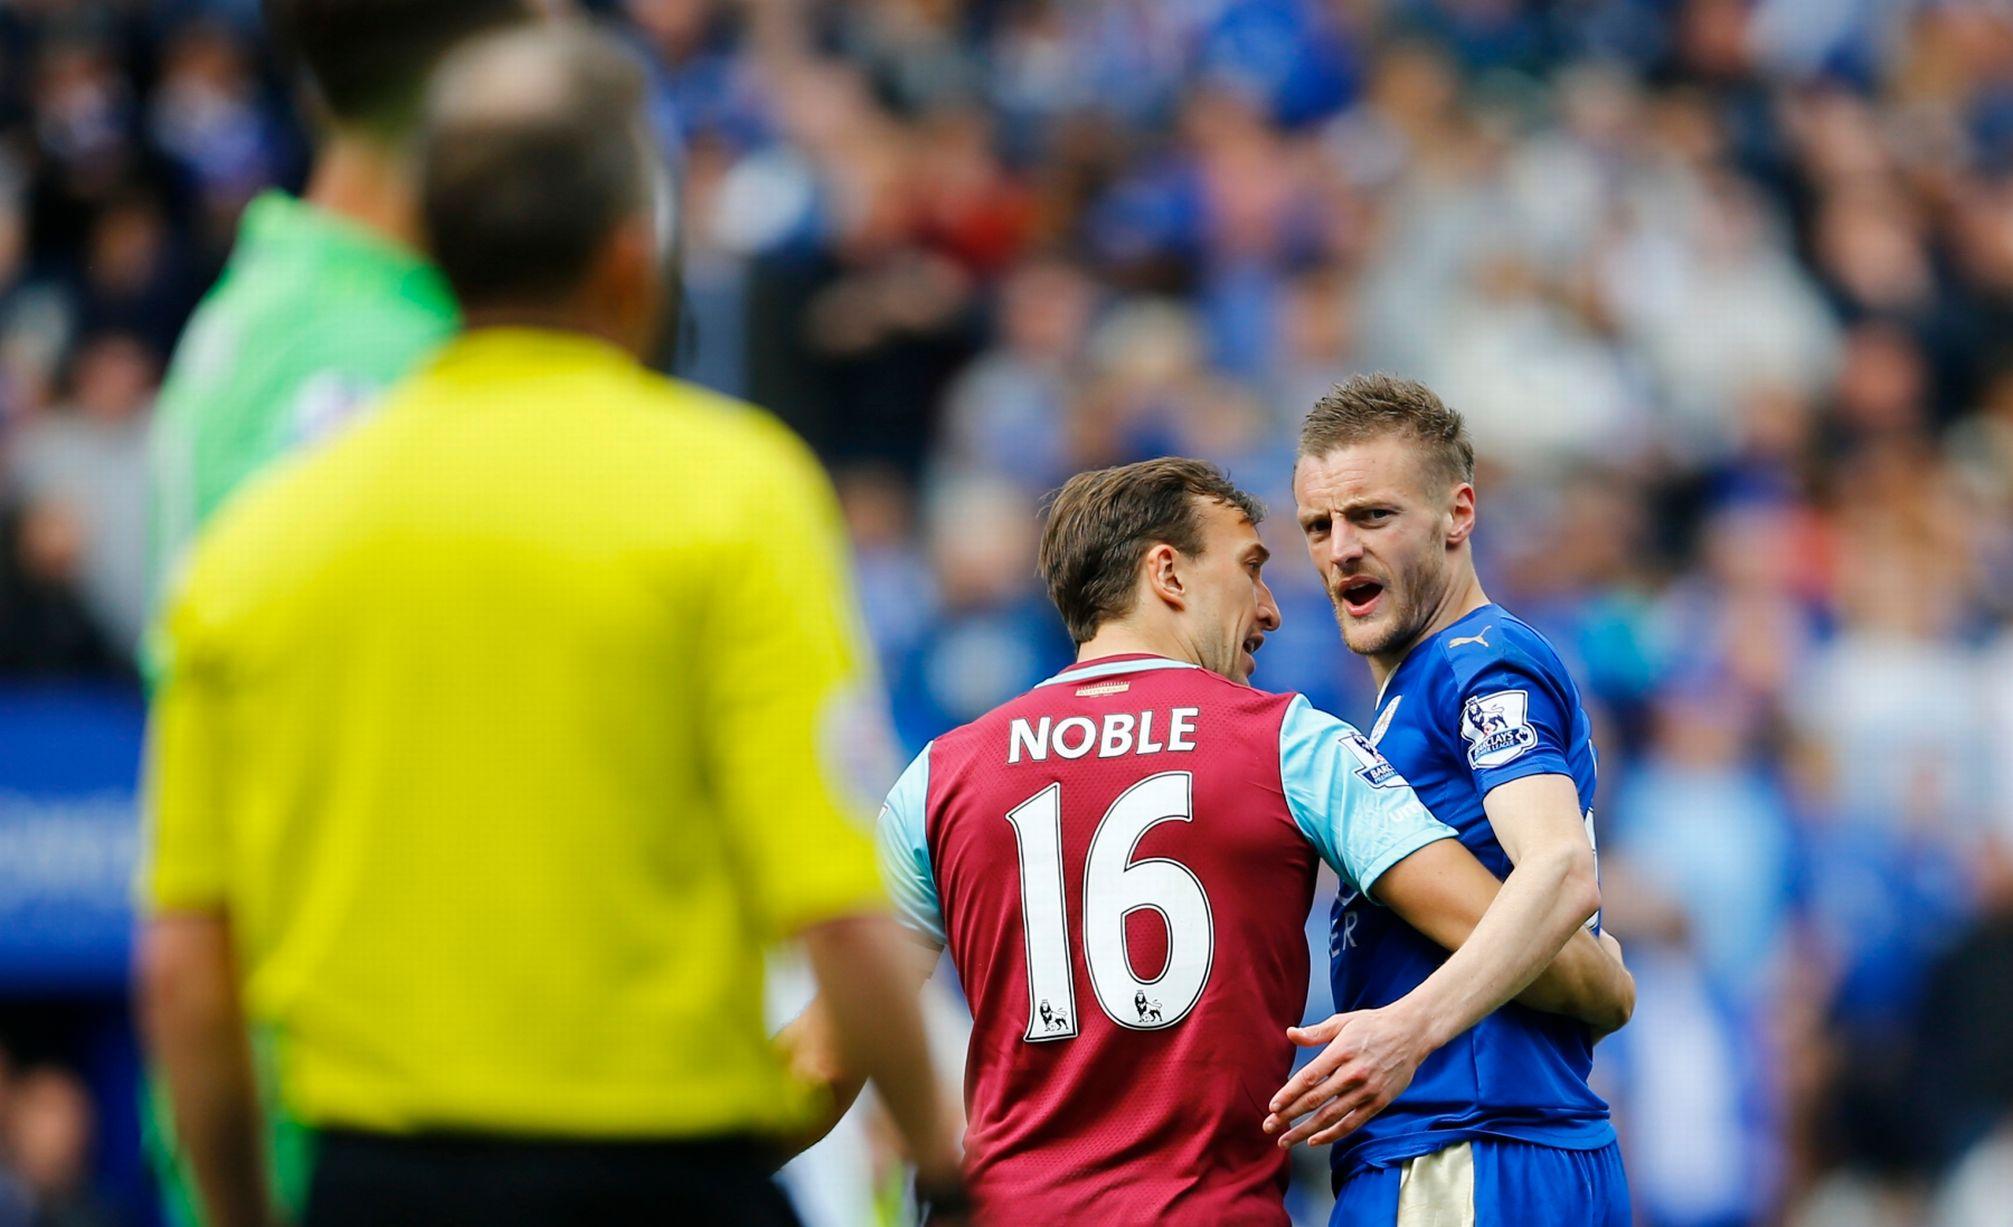 Sarat Keputusan Kontroversial, Leicester Bermain Imbang dengan West Ham